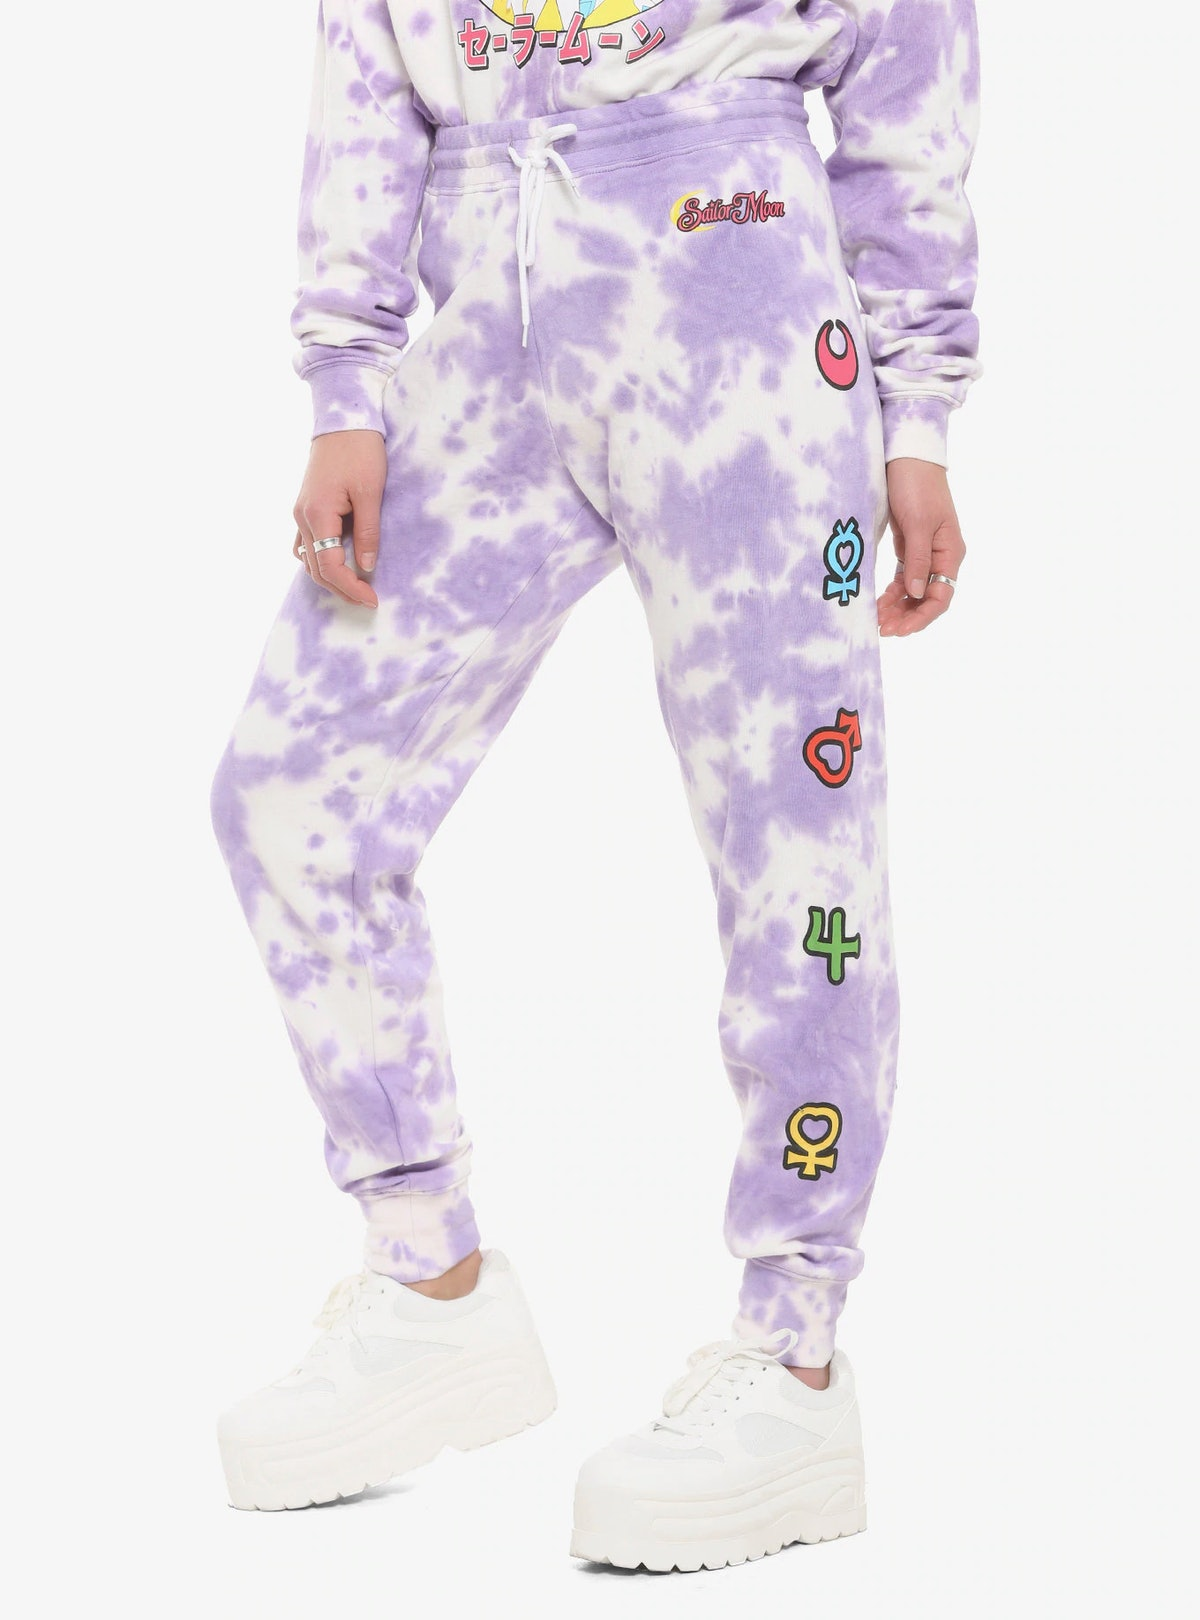 Hot Topic Sailor Moon Purple Tie-Dye Girls Sweatpants